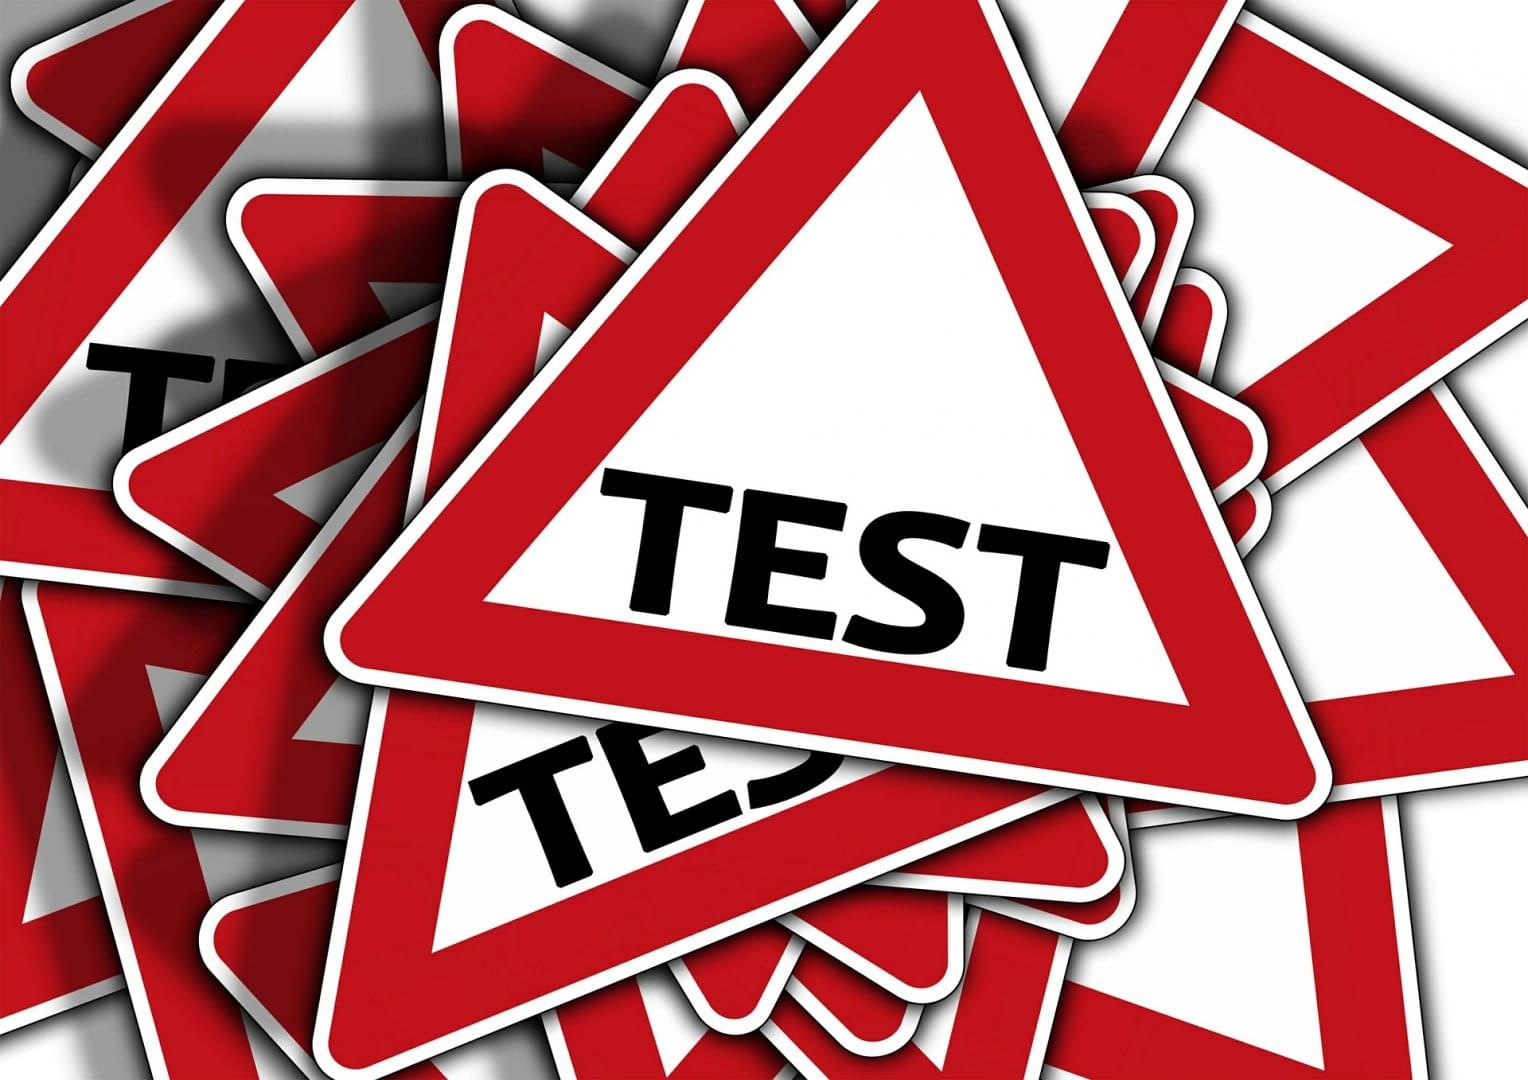 Test (10144)